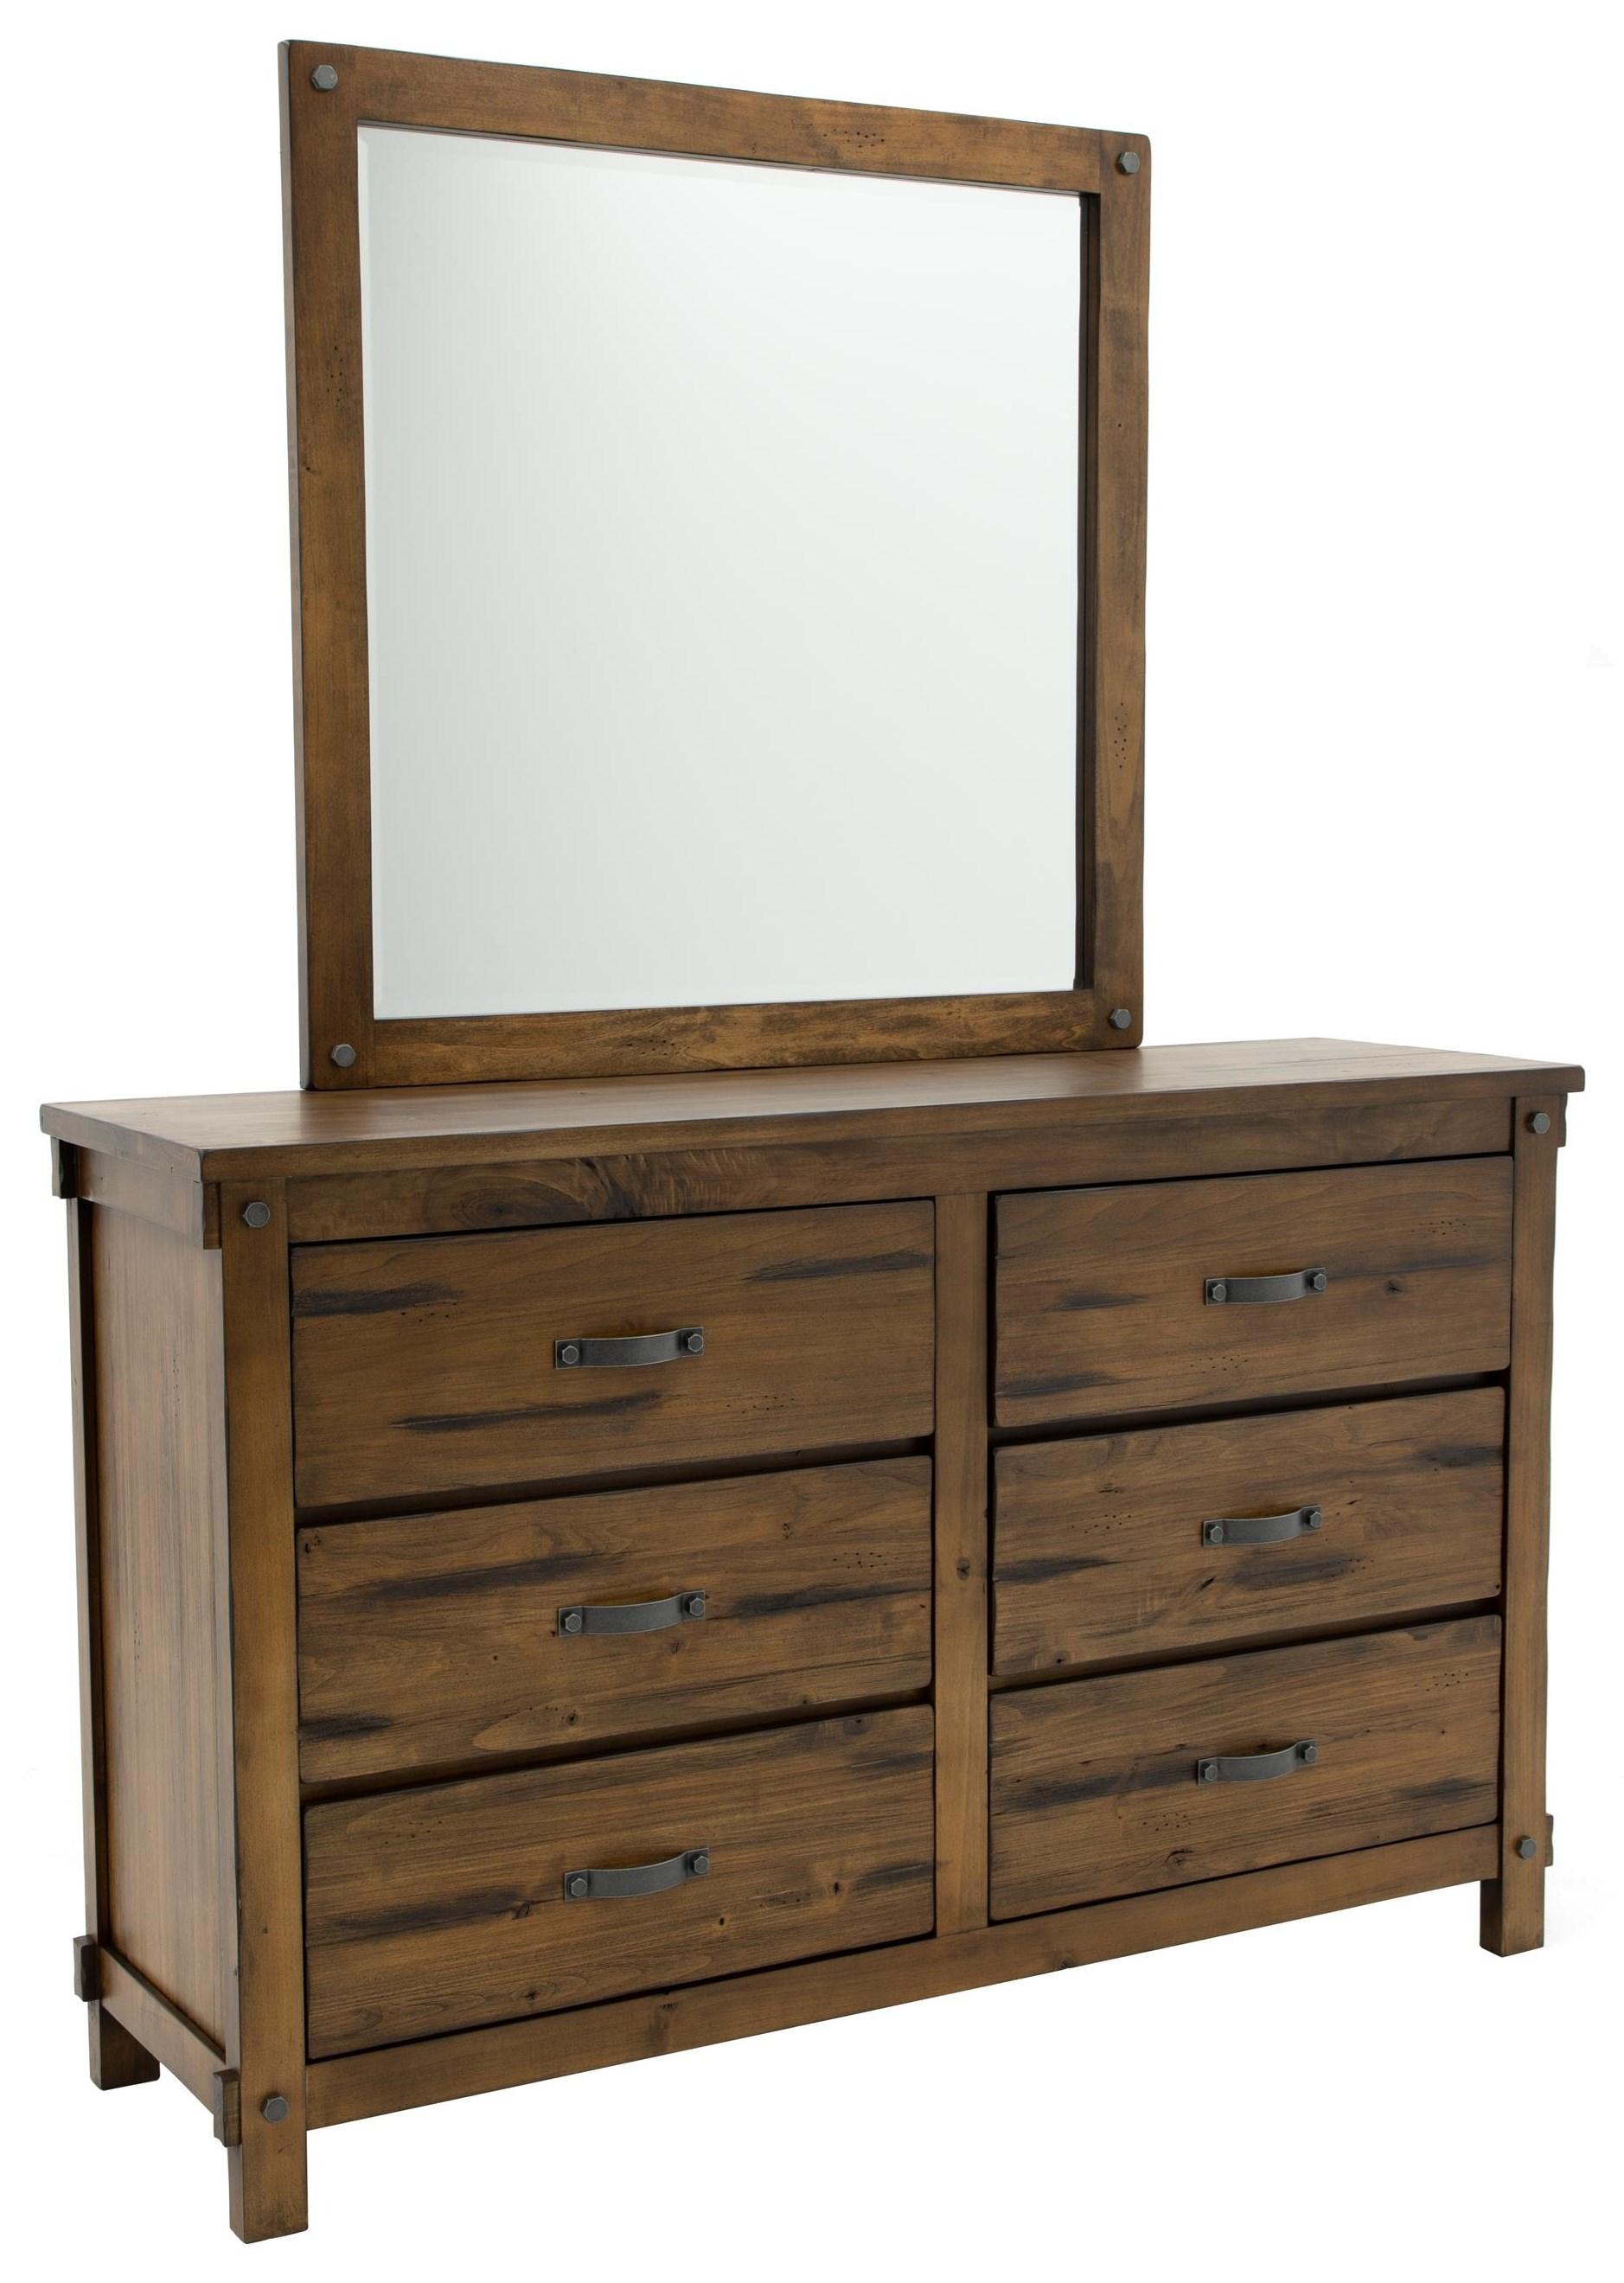 Prescott Dresser and Mirror at Walker's Furniture